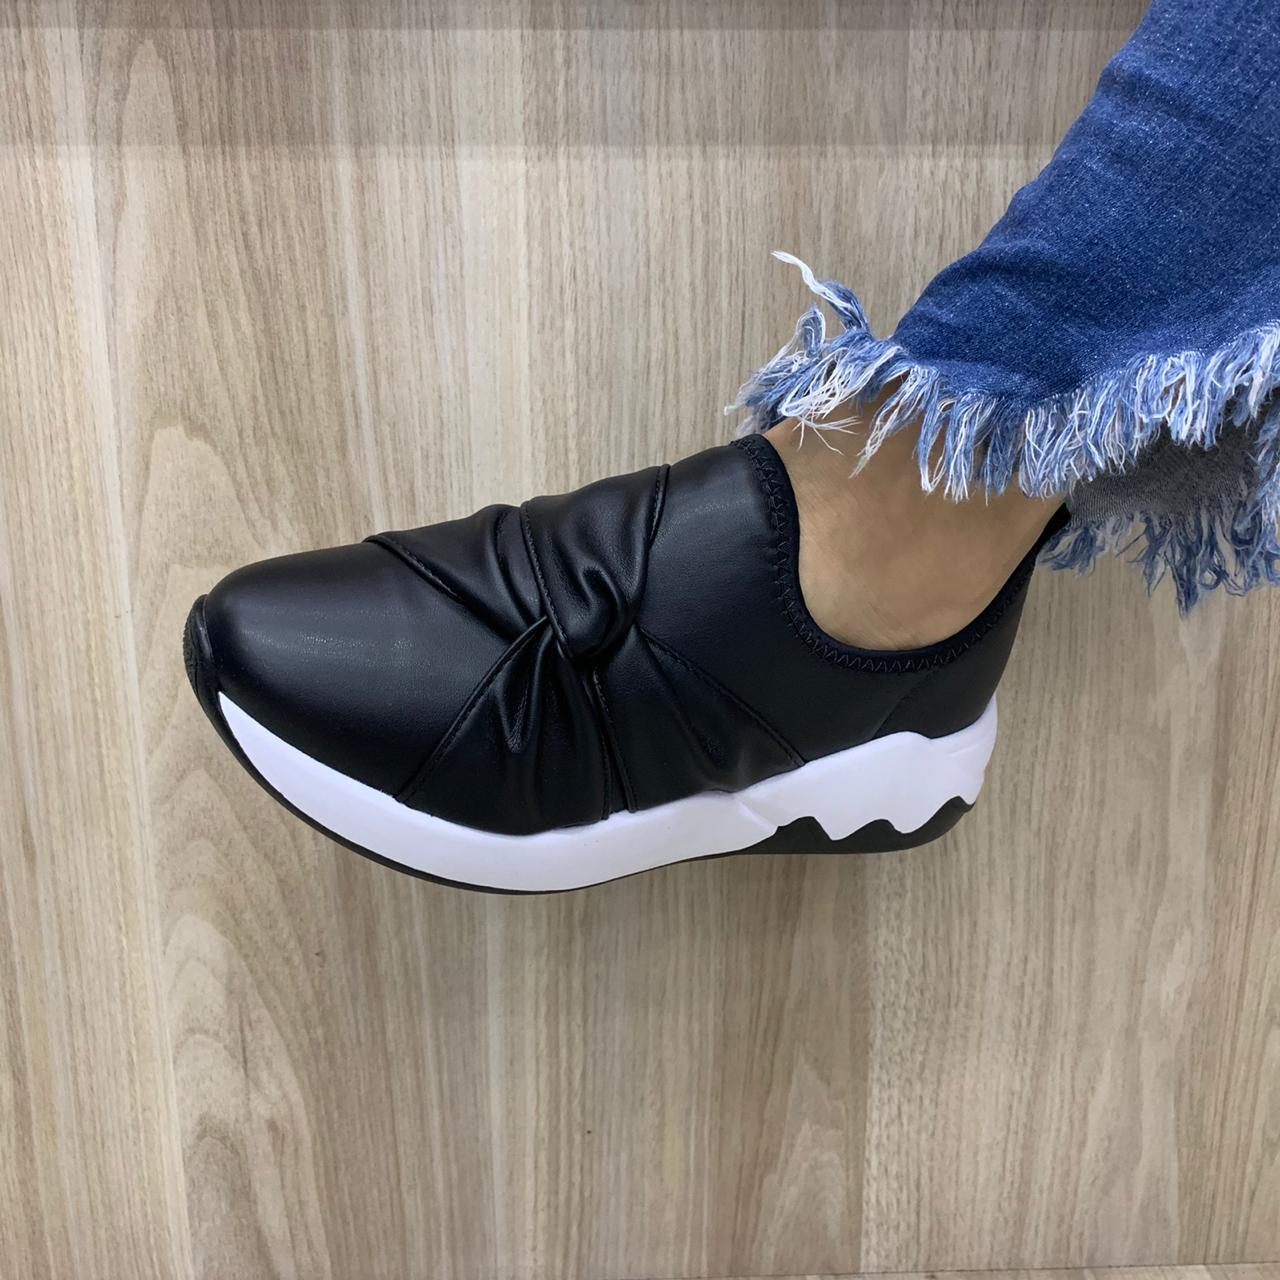 Tênis Beira Rio Chunky Sneaker Sem Cadarço 4242.102 Feminino